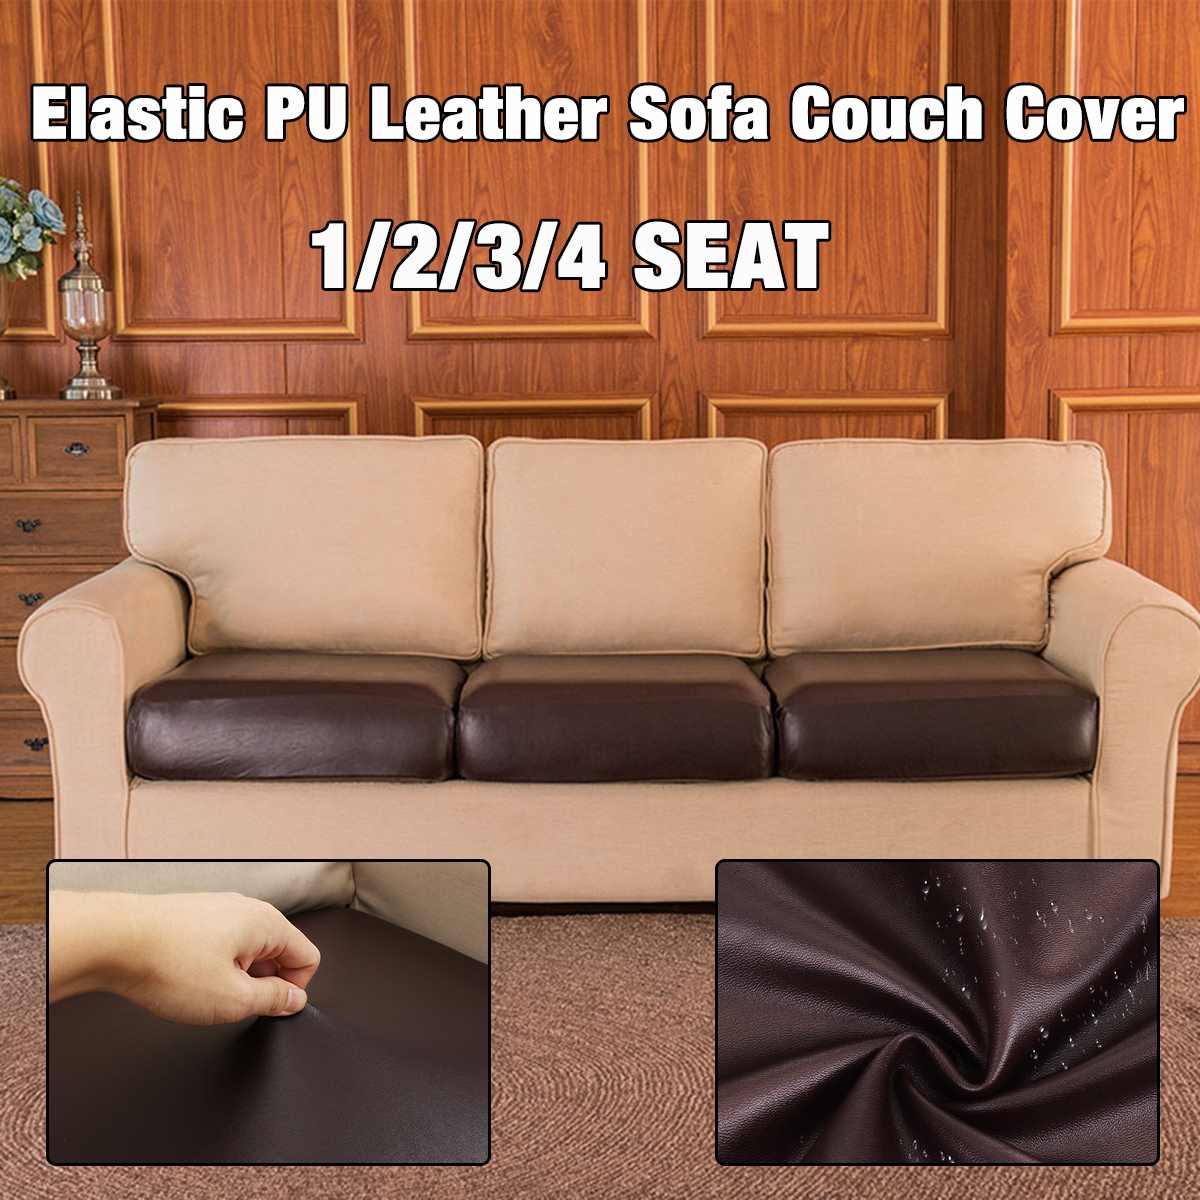 Funda de sofá de poliéster PU impermeable estilo europeo sofá cama funda de sofá asiento elástico sofá cama Protector